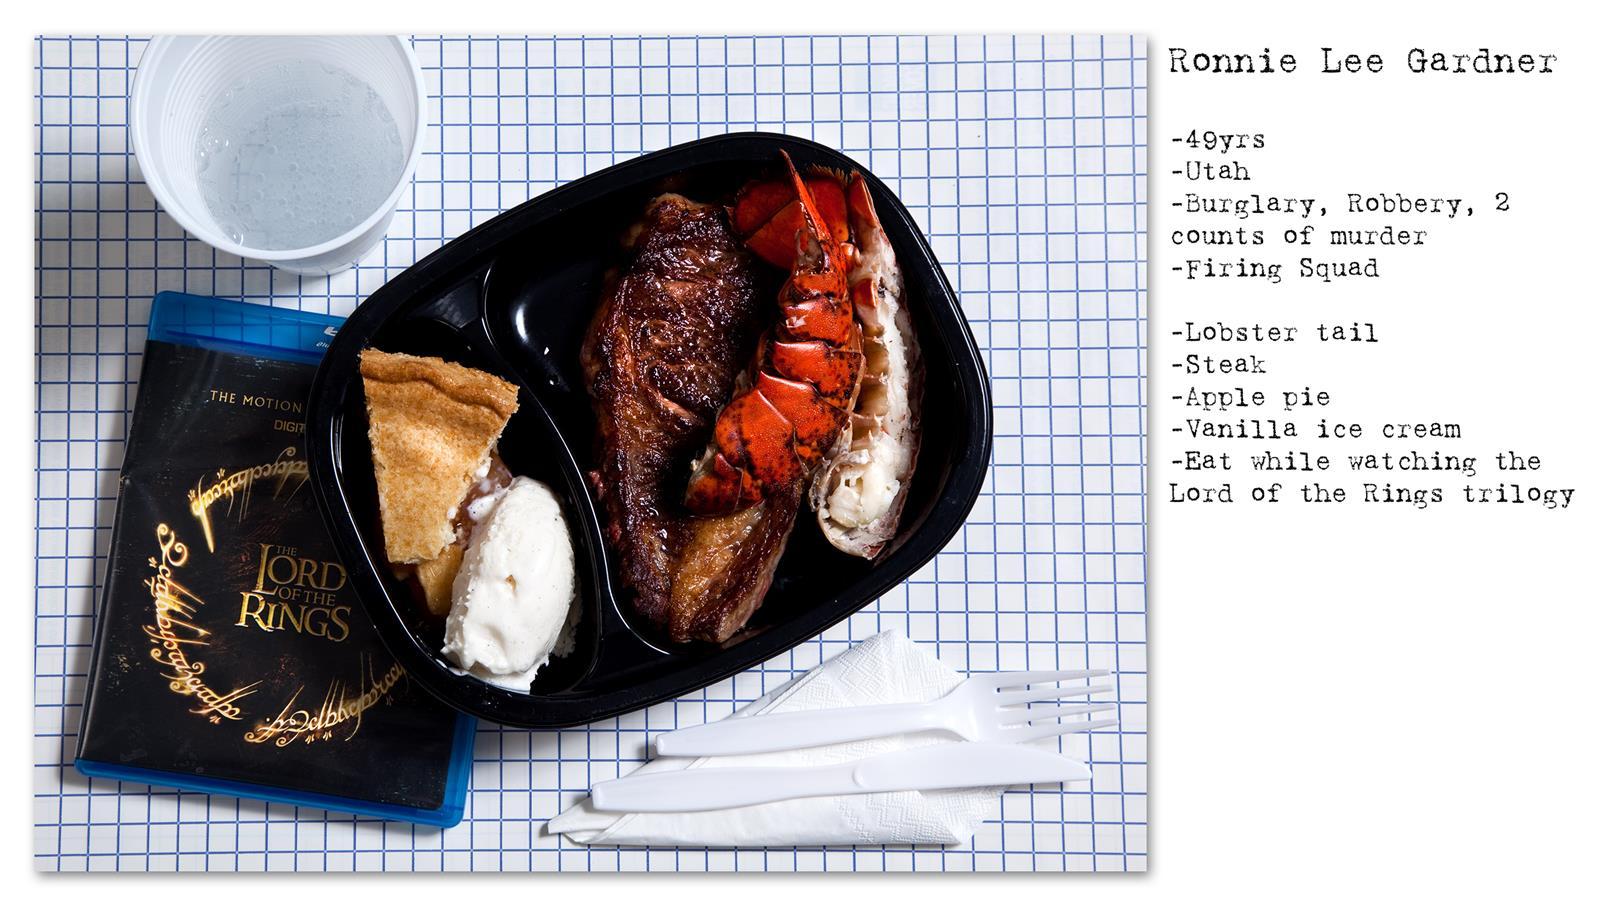 Death Row Prisoner's Last Meal (10)